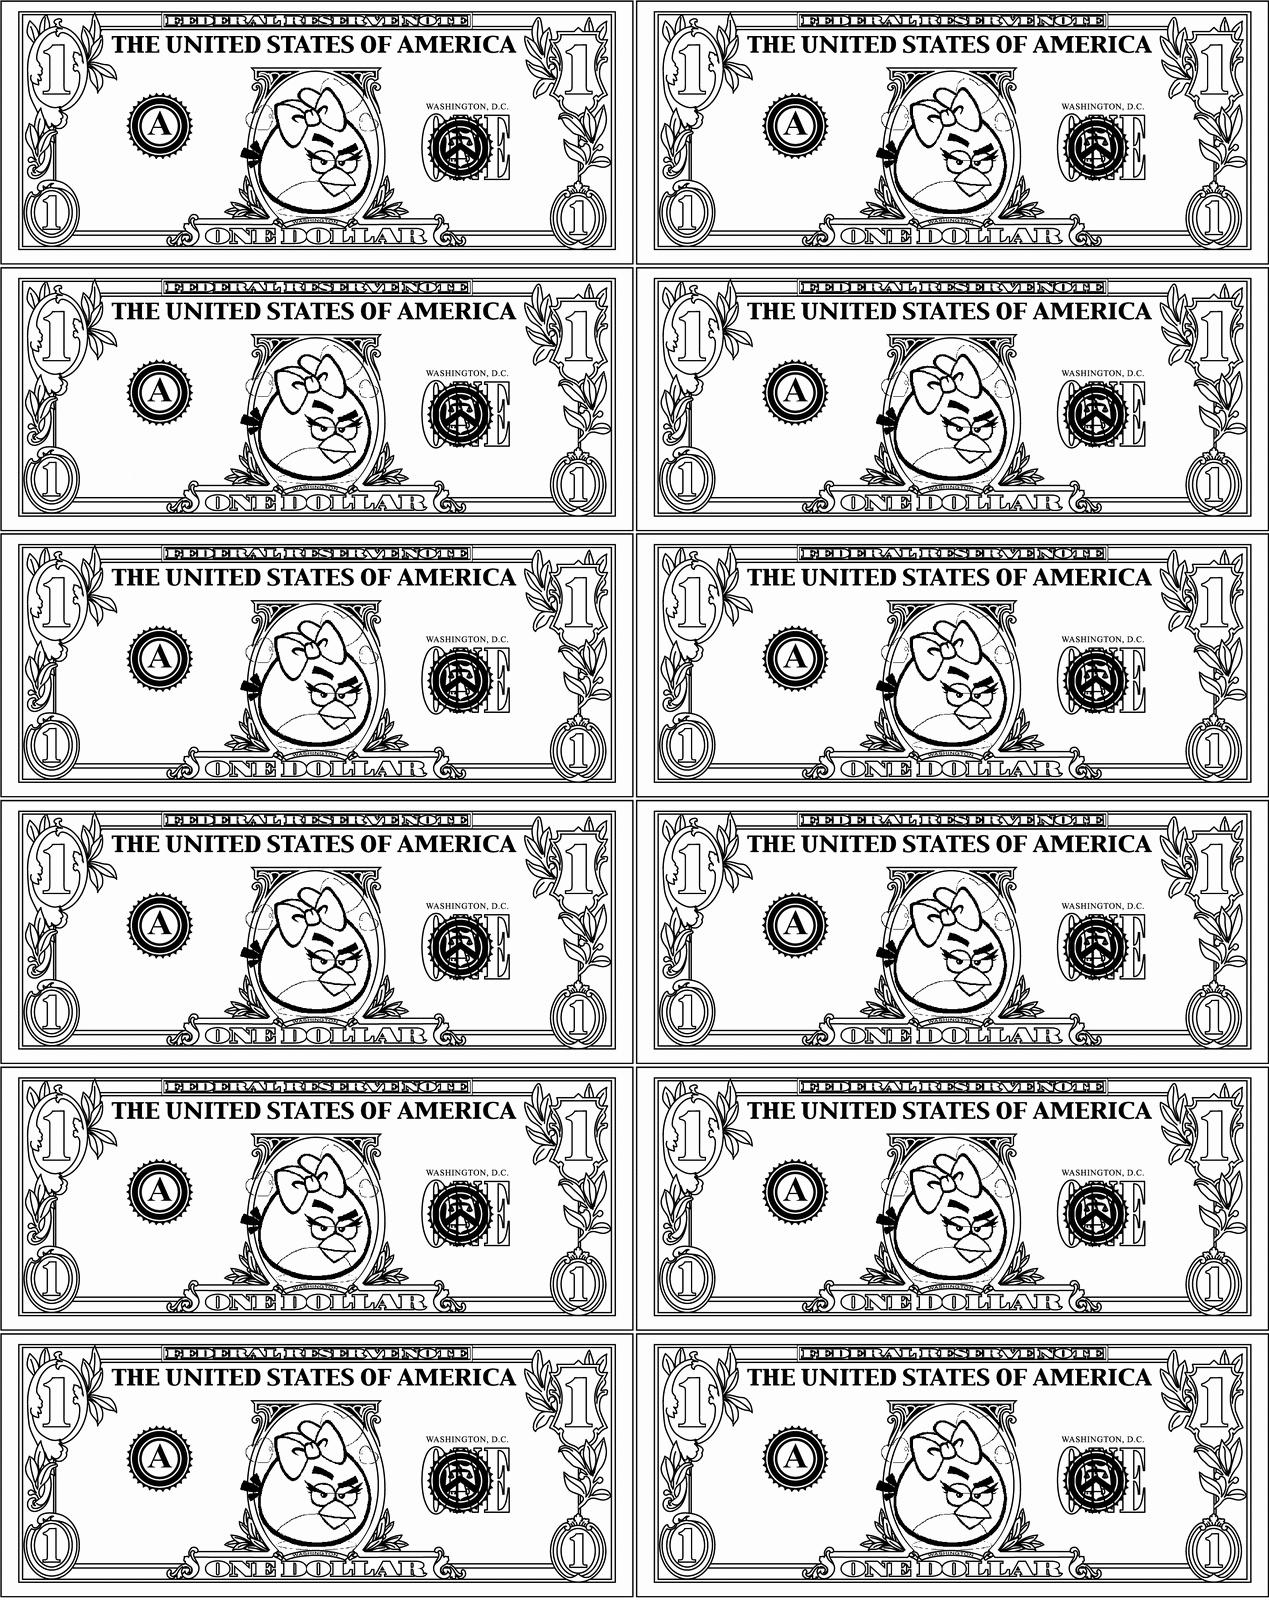 Free Printable Play Money Awesome Printable Play Money for Kids